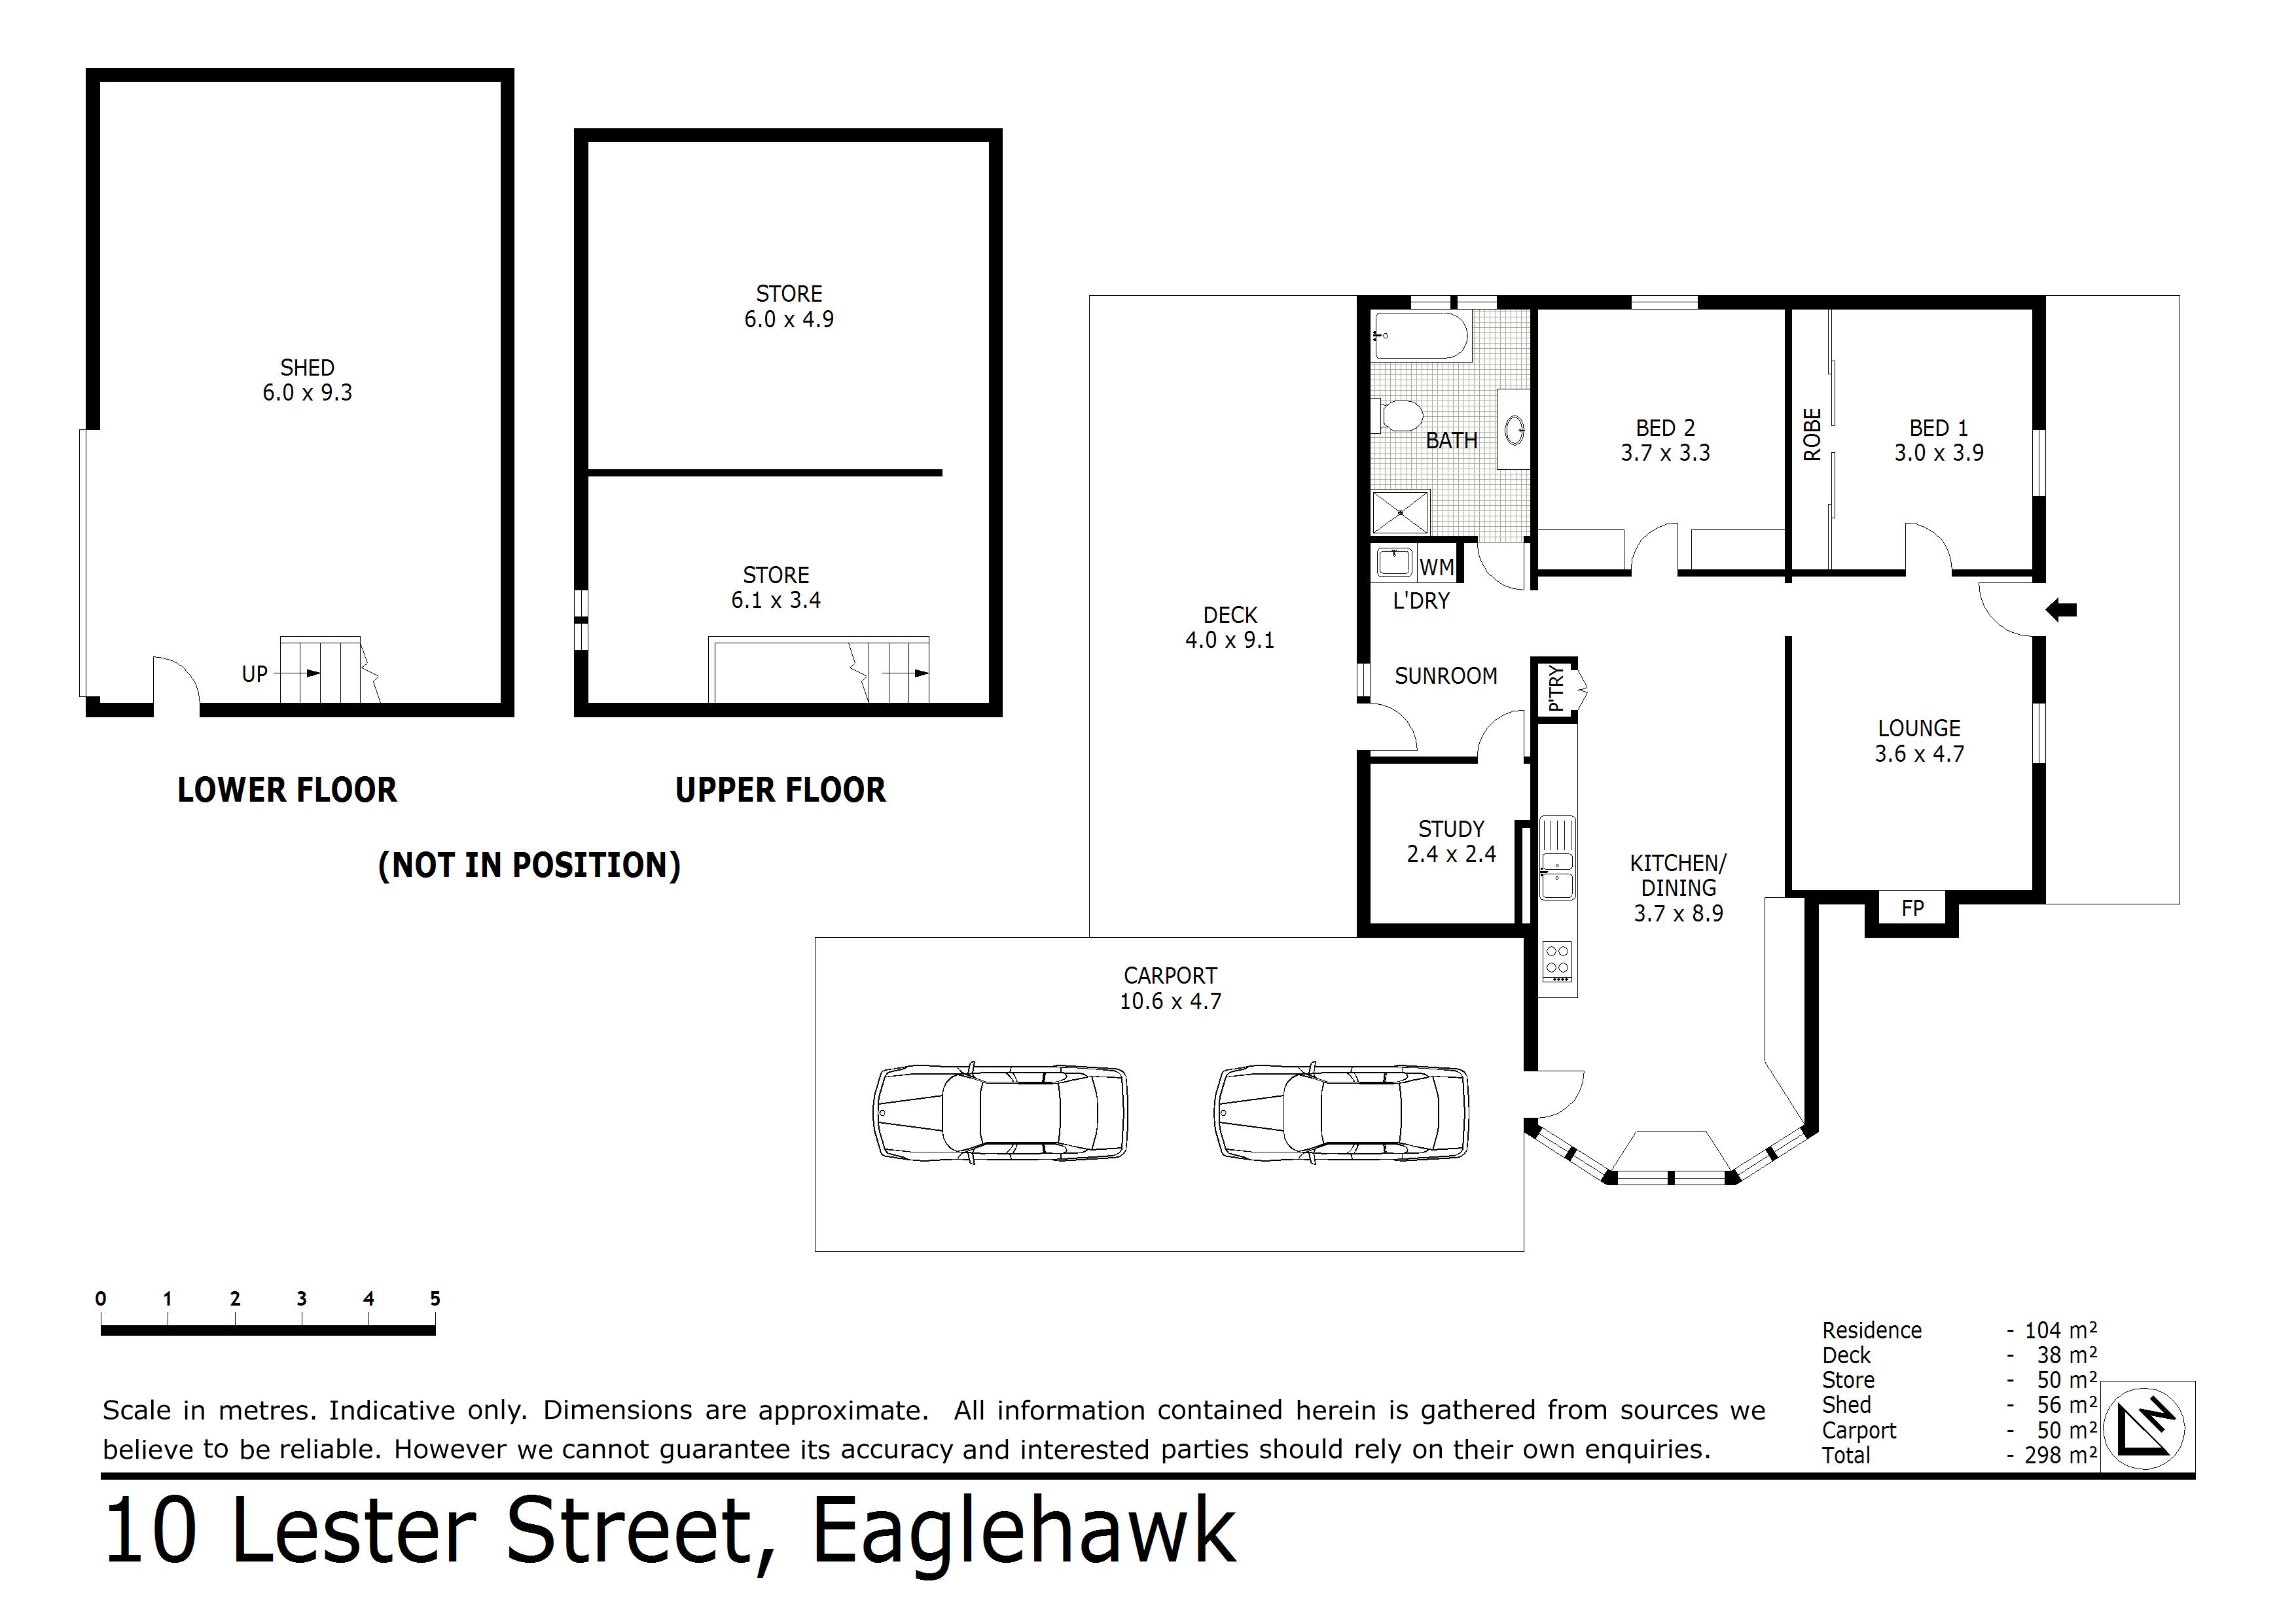 10 Lester Street, Eaglehawk, VIC 3556